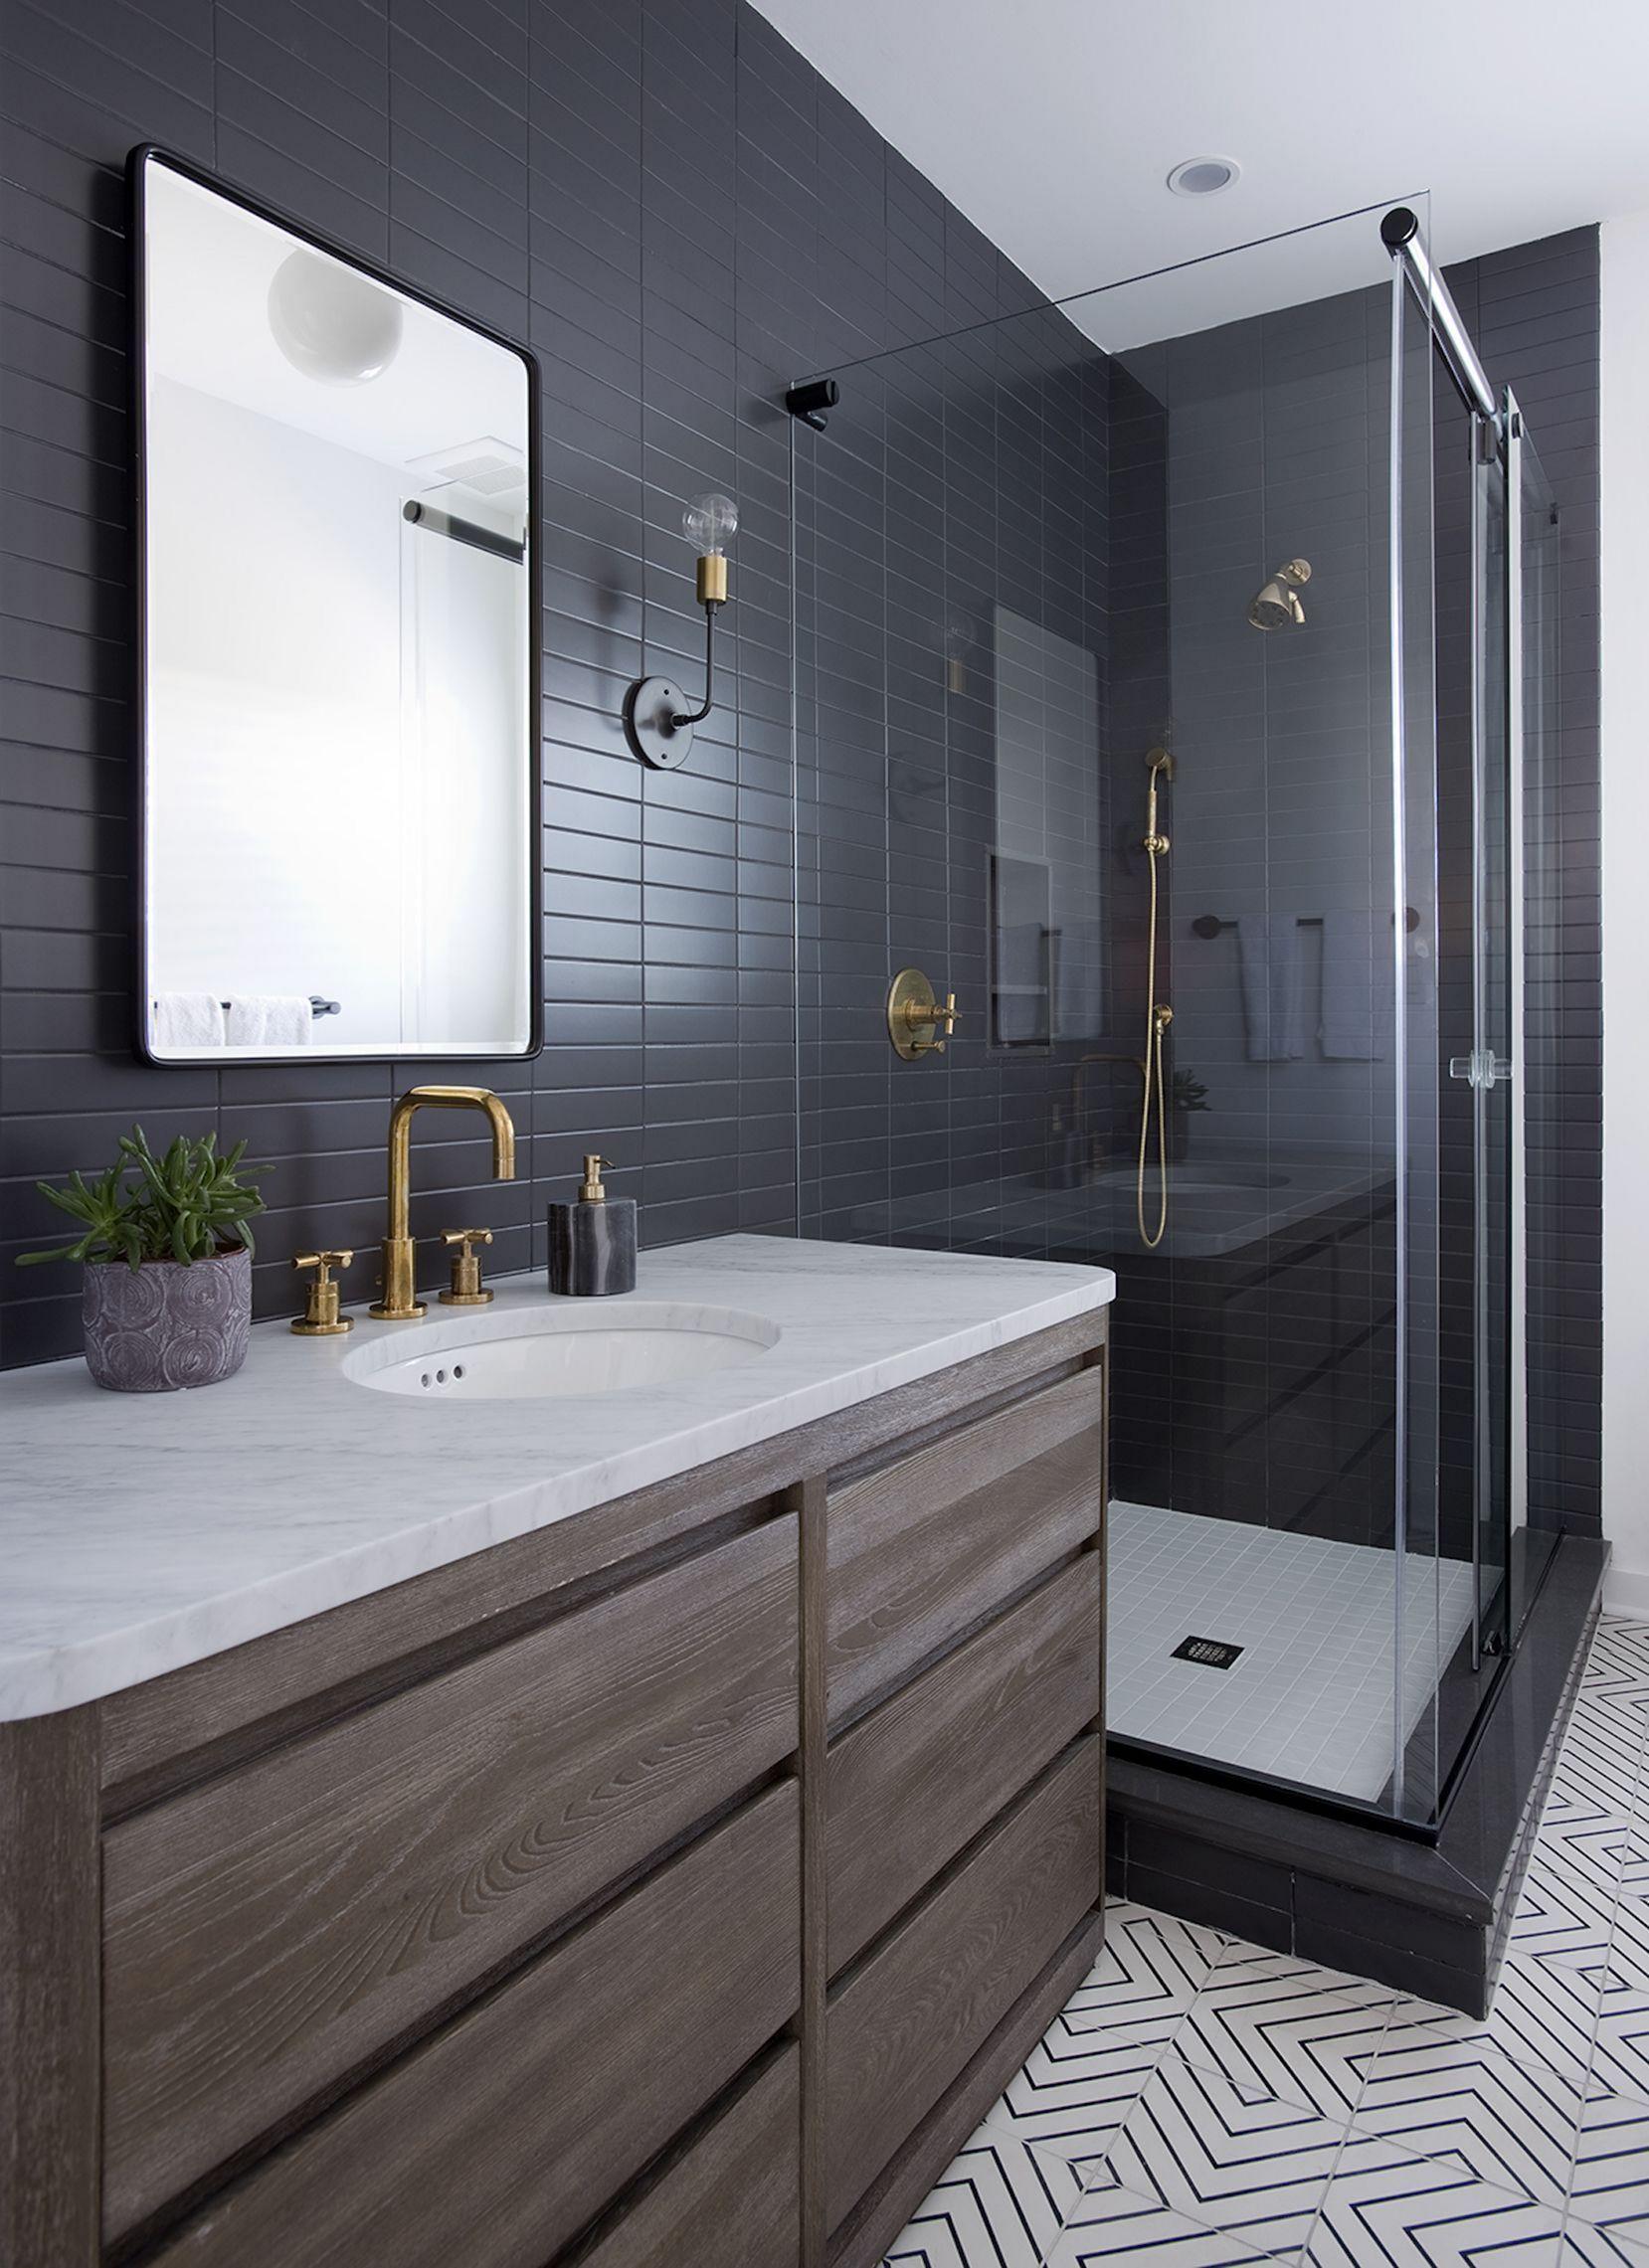 15 stunning small modern bathroom design ideas most on stunning small bathroom design ideas id=85693